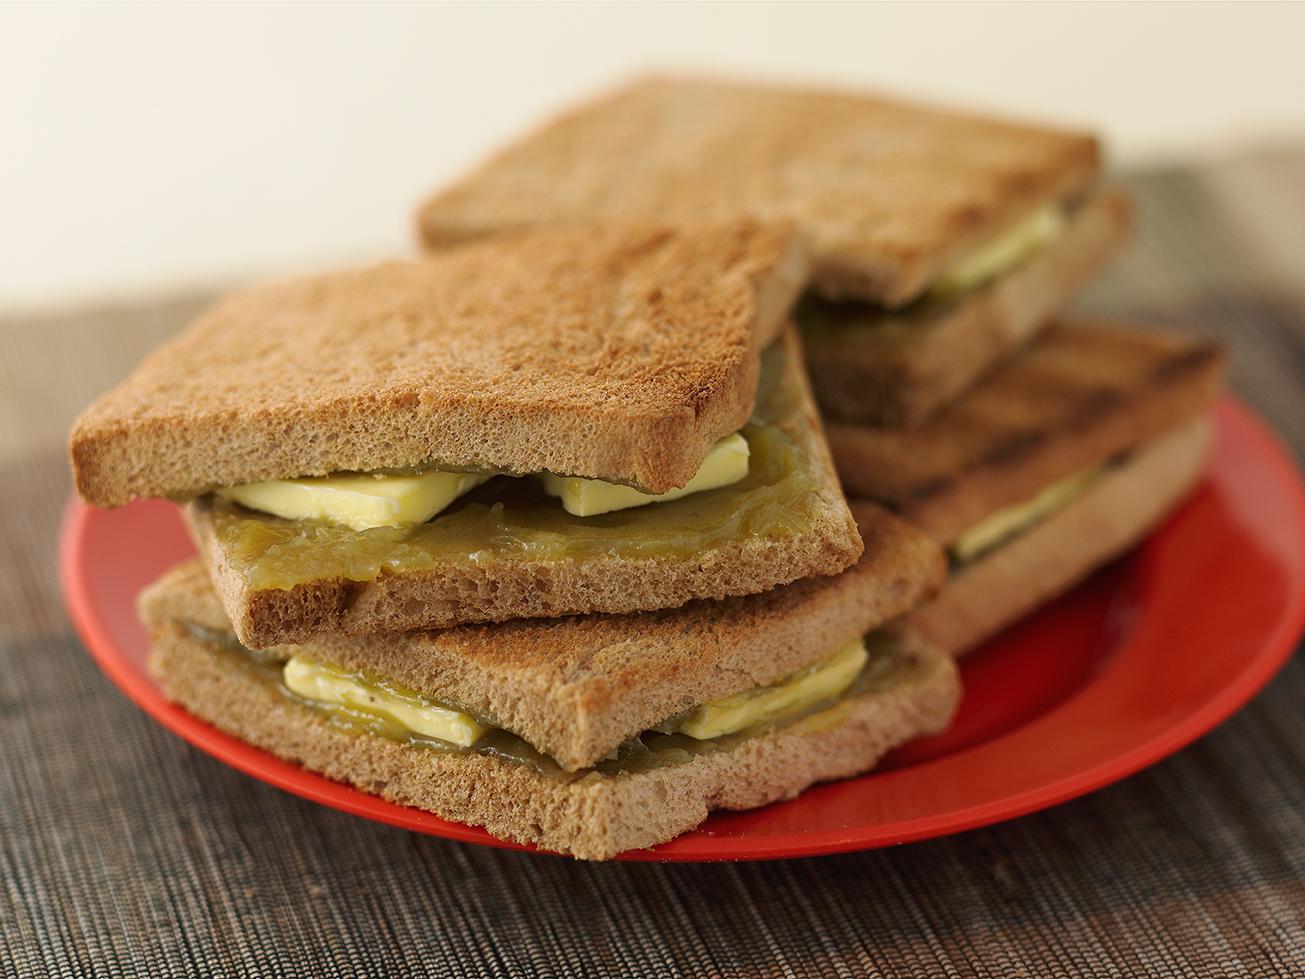 kaya toast coconut jam singapore breakfast on bread cold butte traditional hawker street food